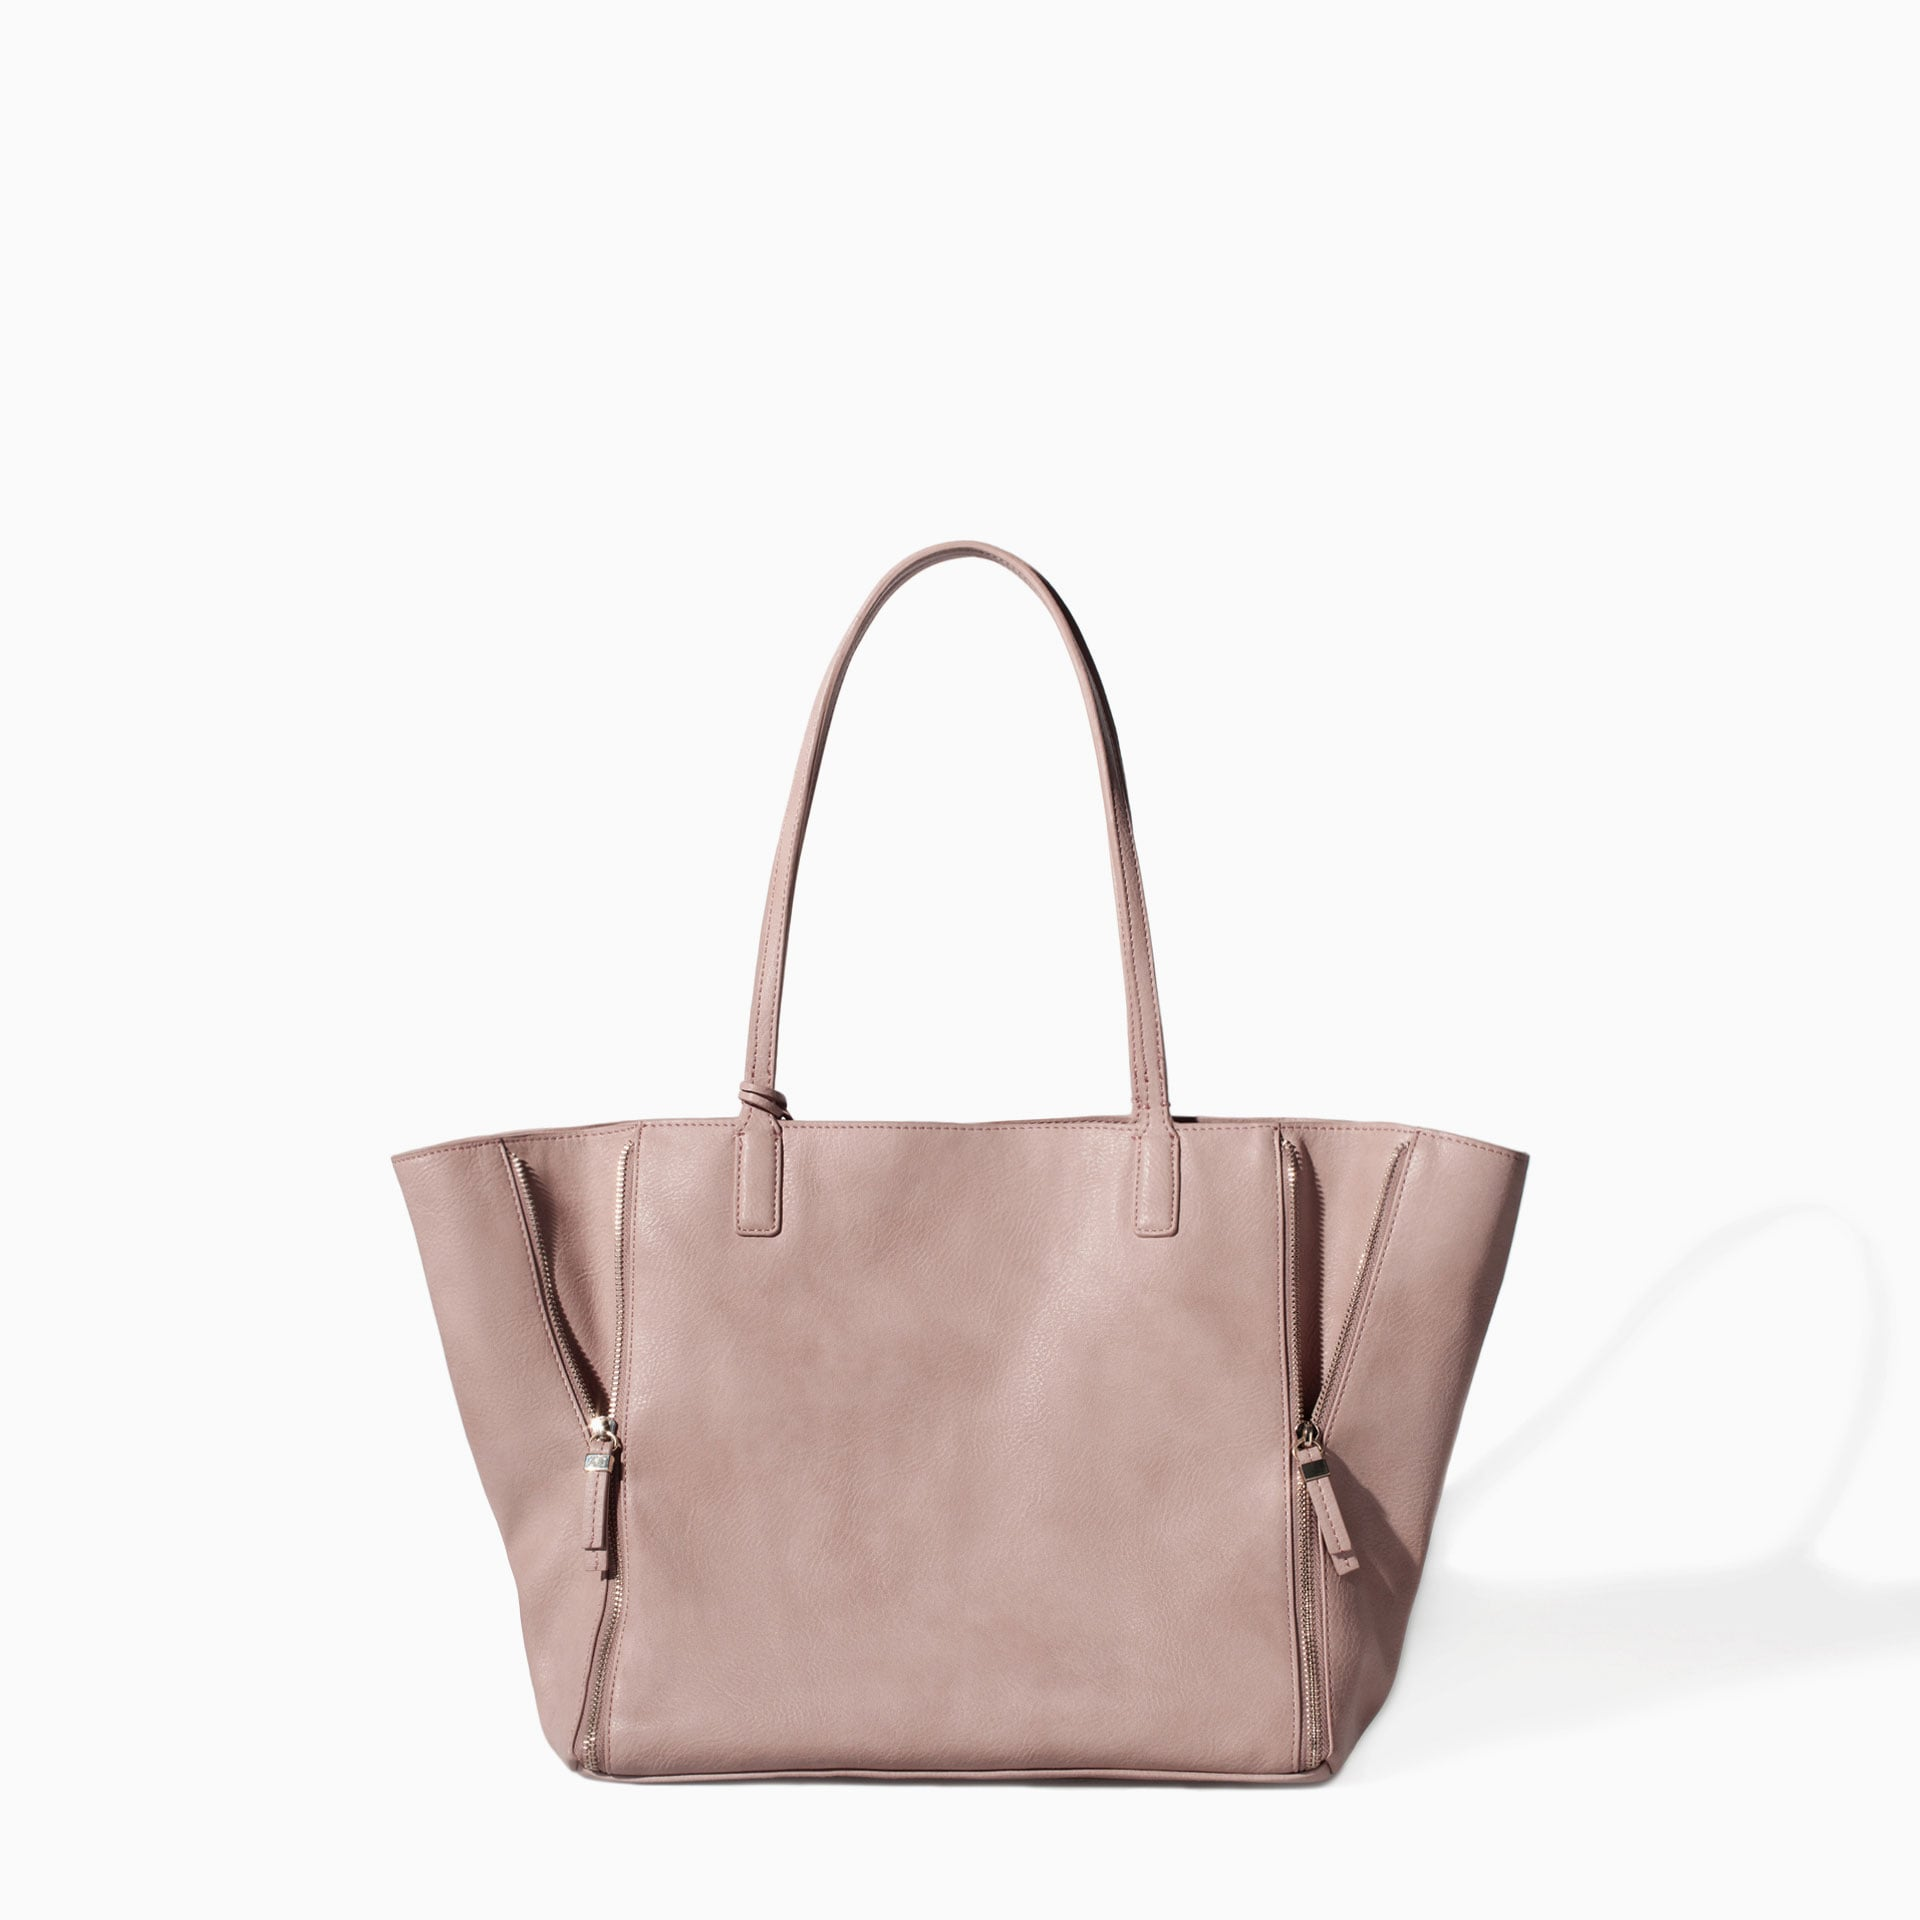 Zara Combined Shopper Bag ($80)